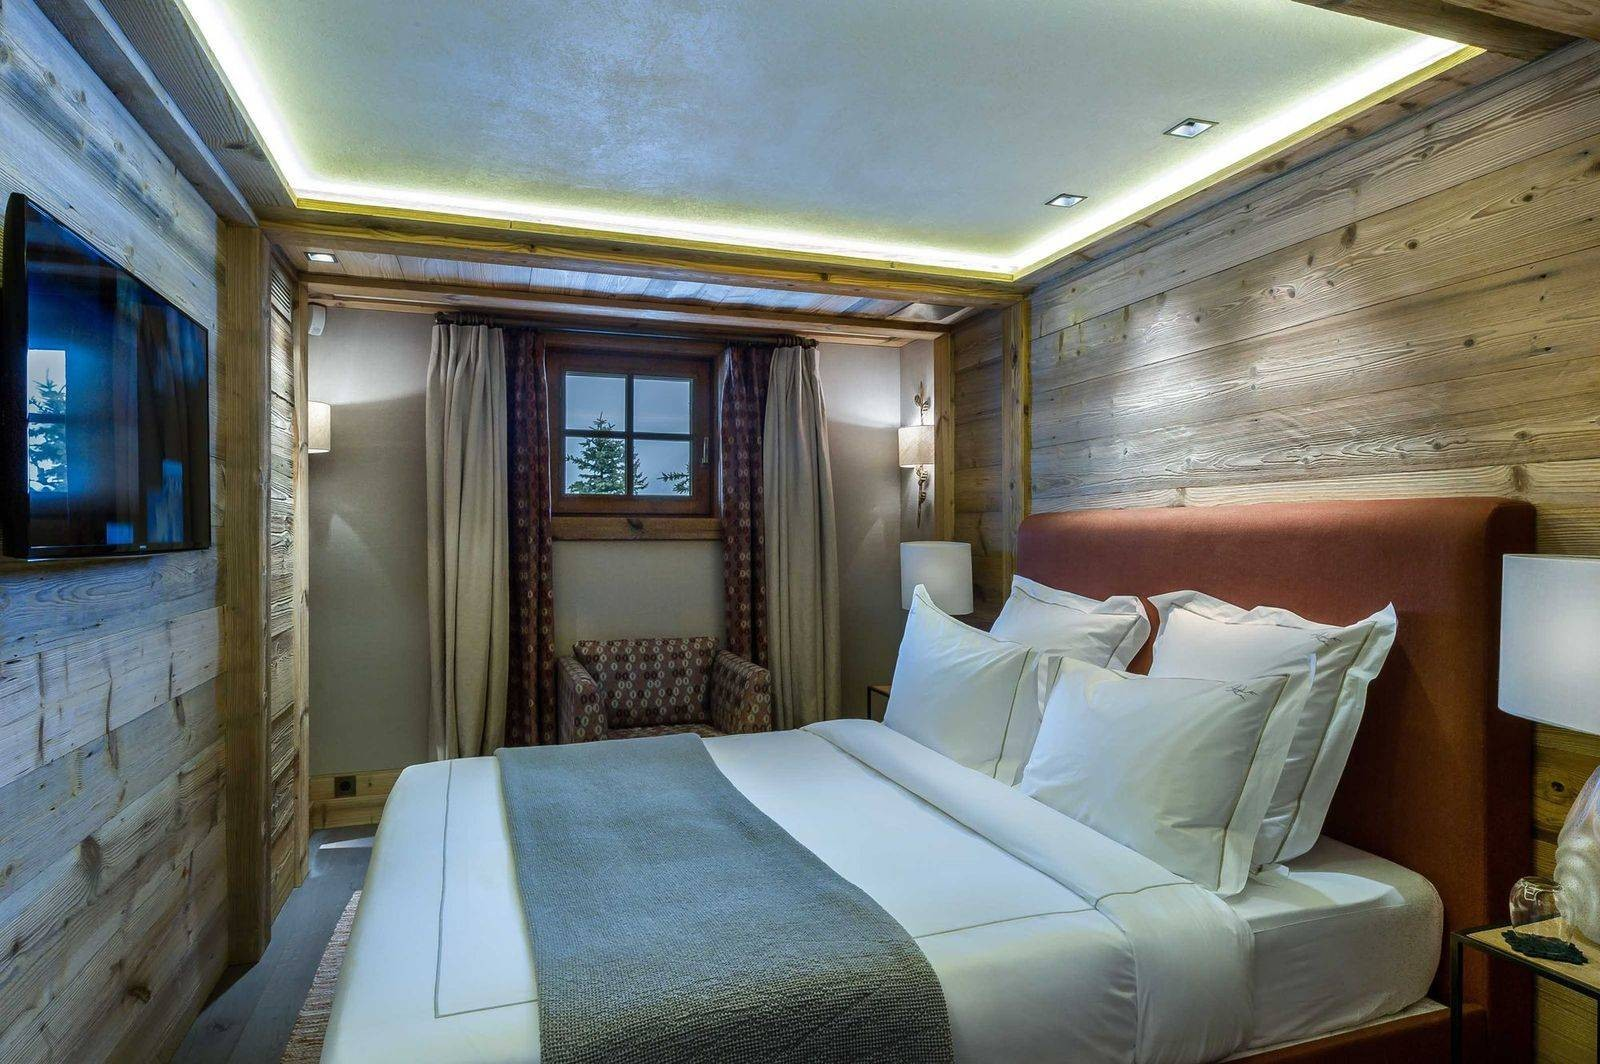 Courchevel 1850 Luxury Rental Chalet Chursinite Bedroom 7